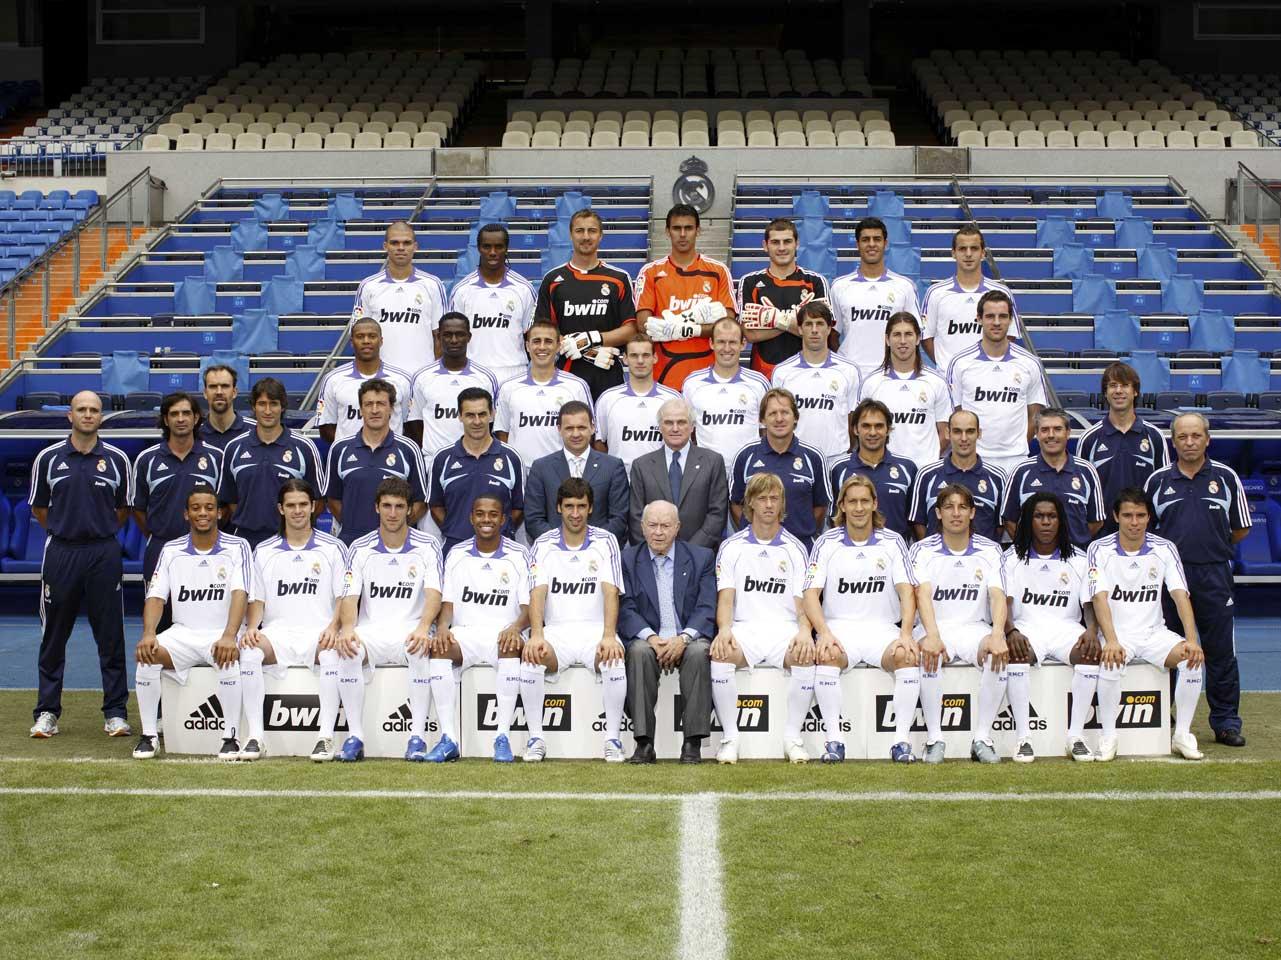 Football Clubs: Tom Brady: Realmadrid Football Club Players